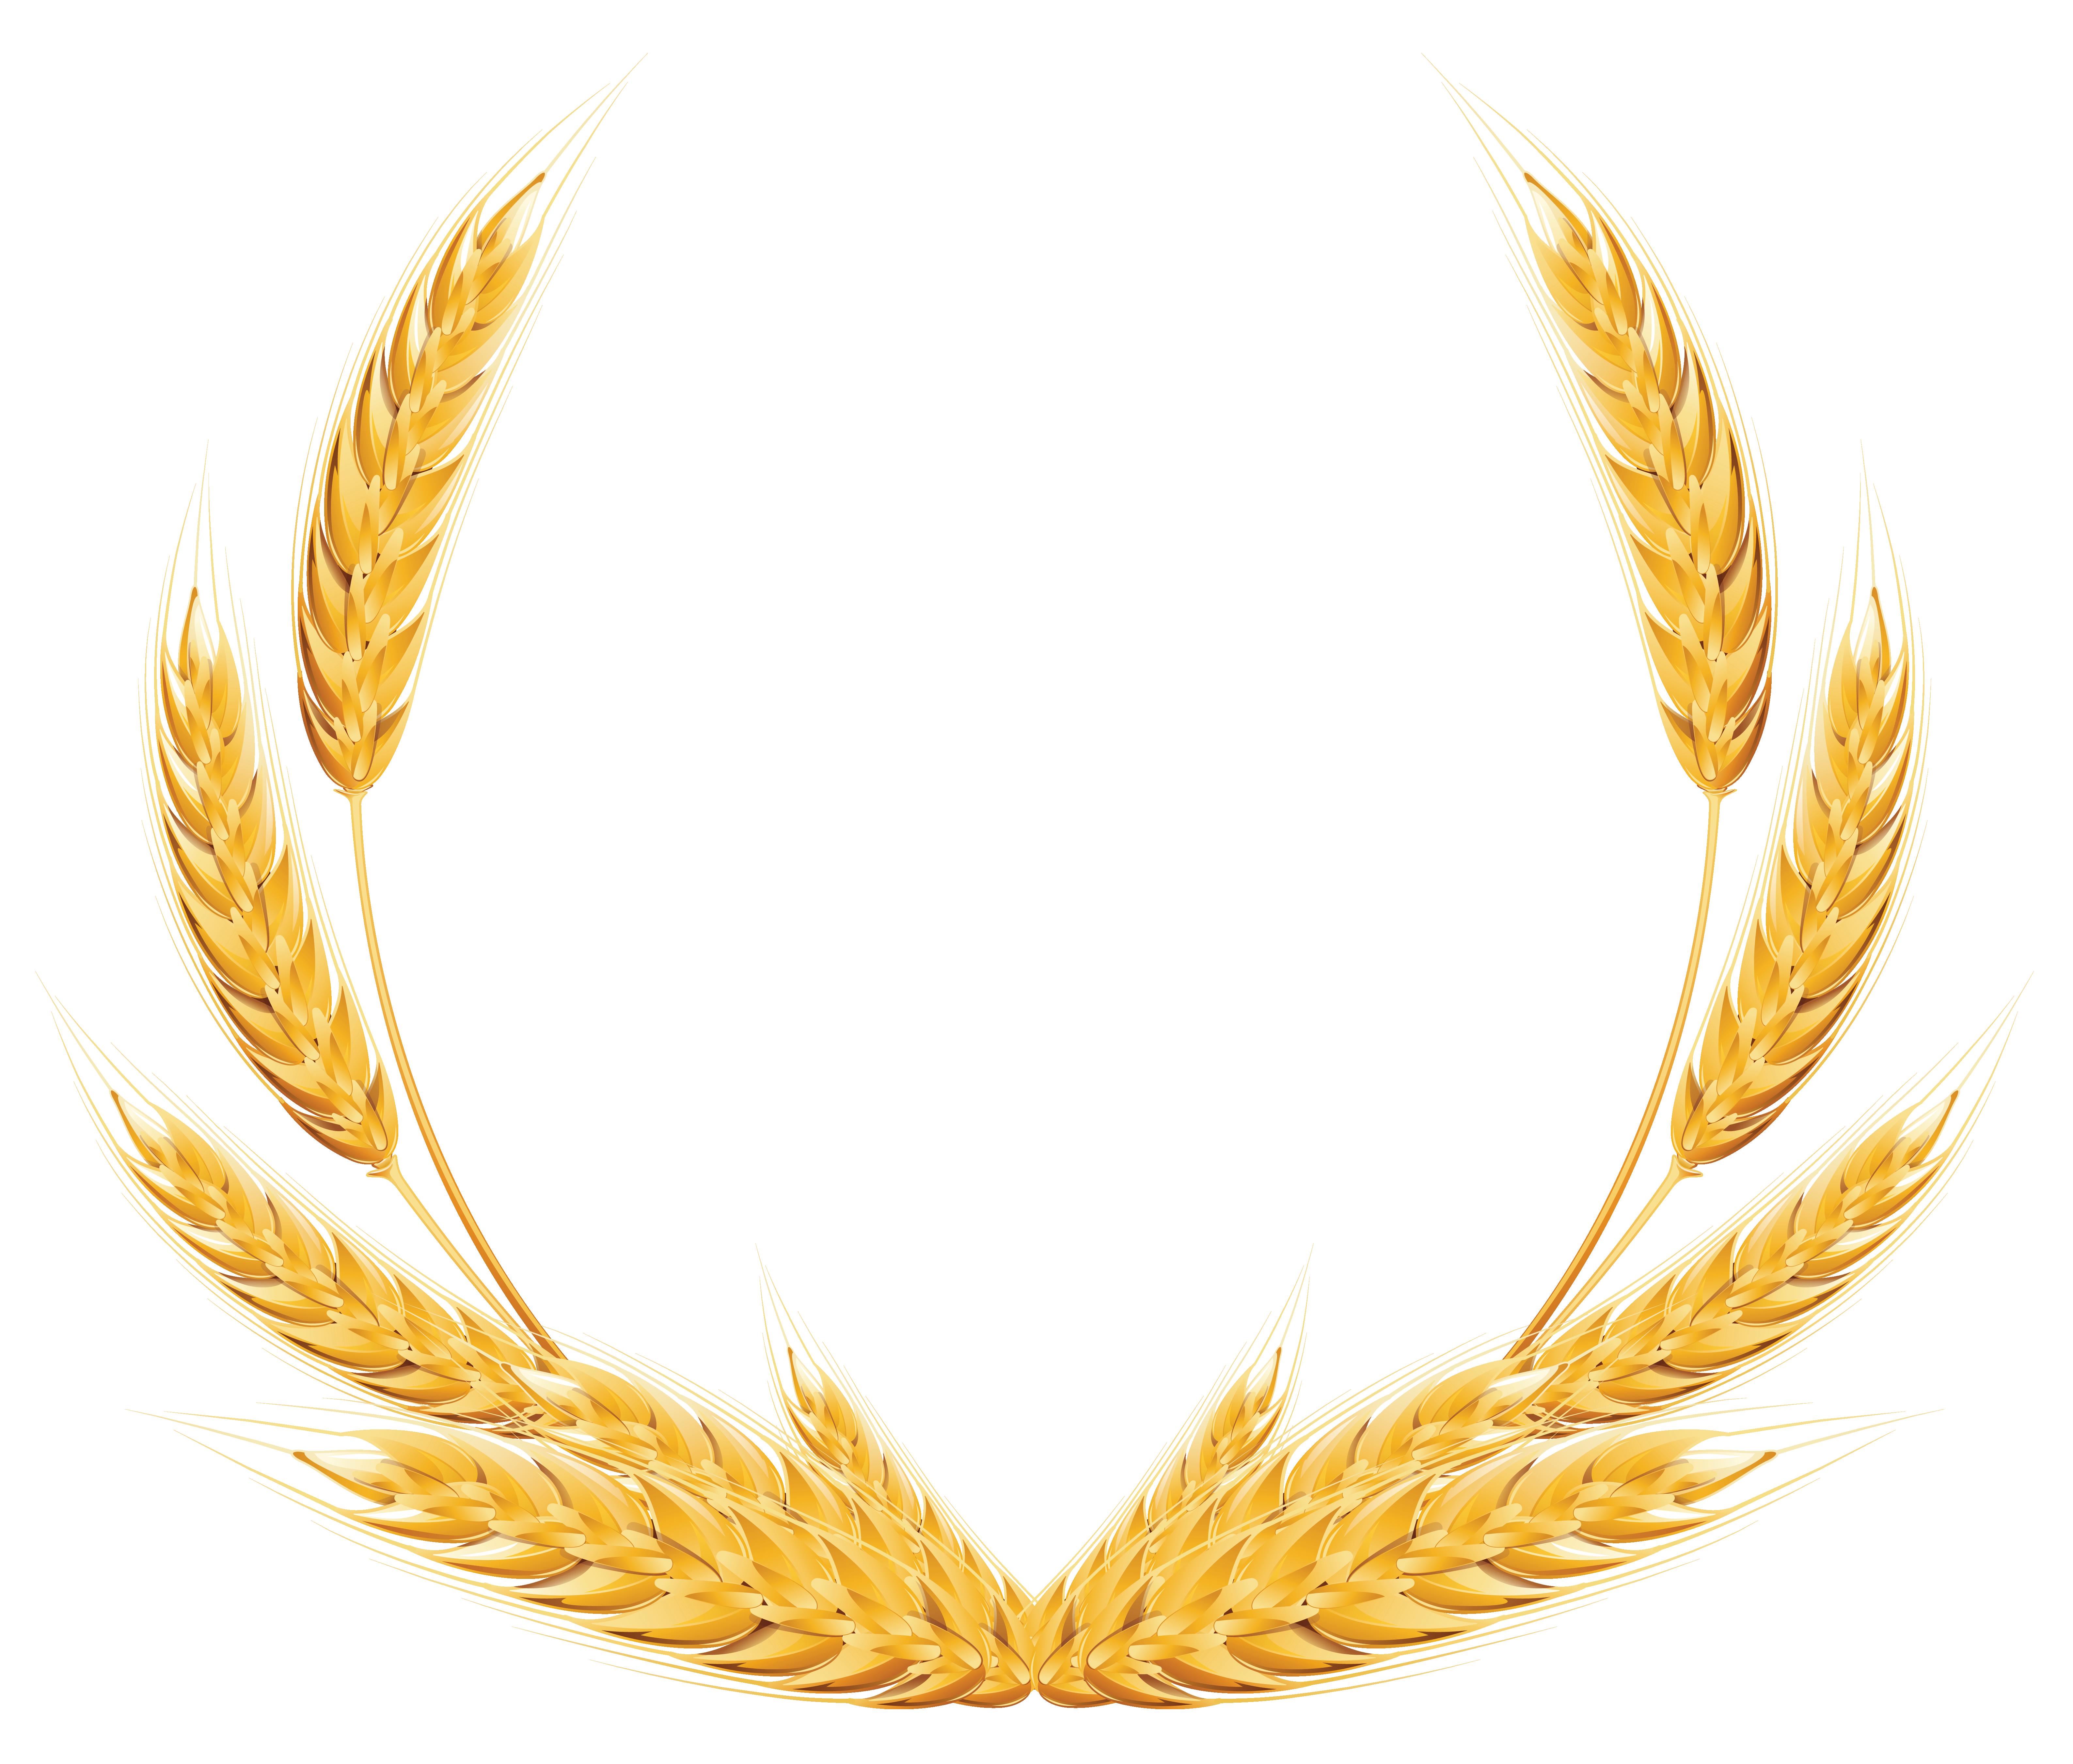 Wheat png . Grain clipart cereal grain